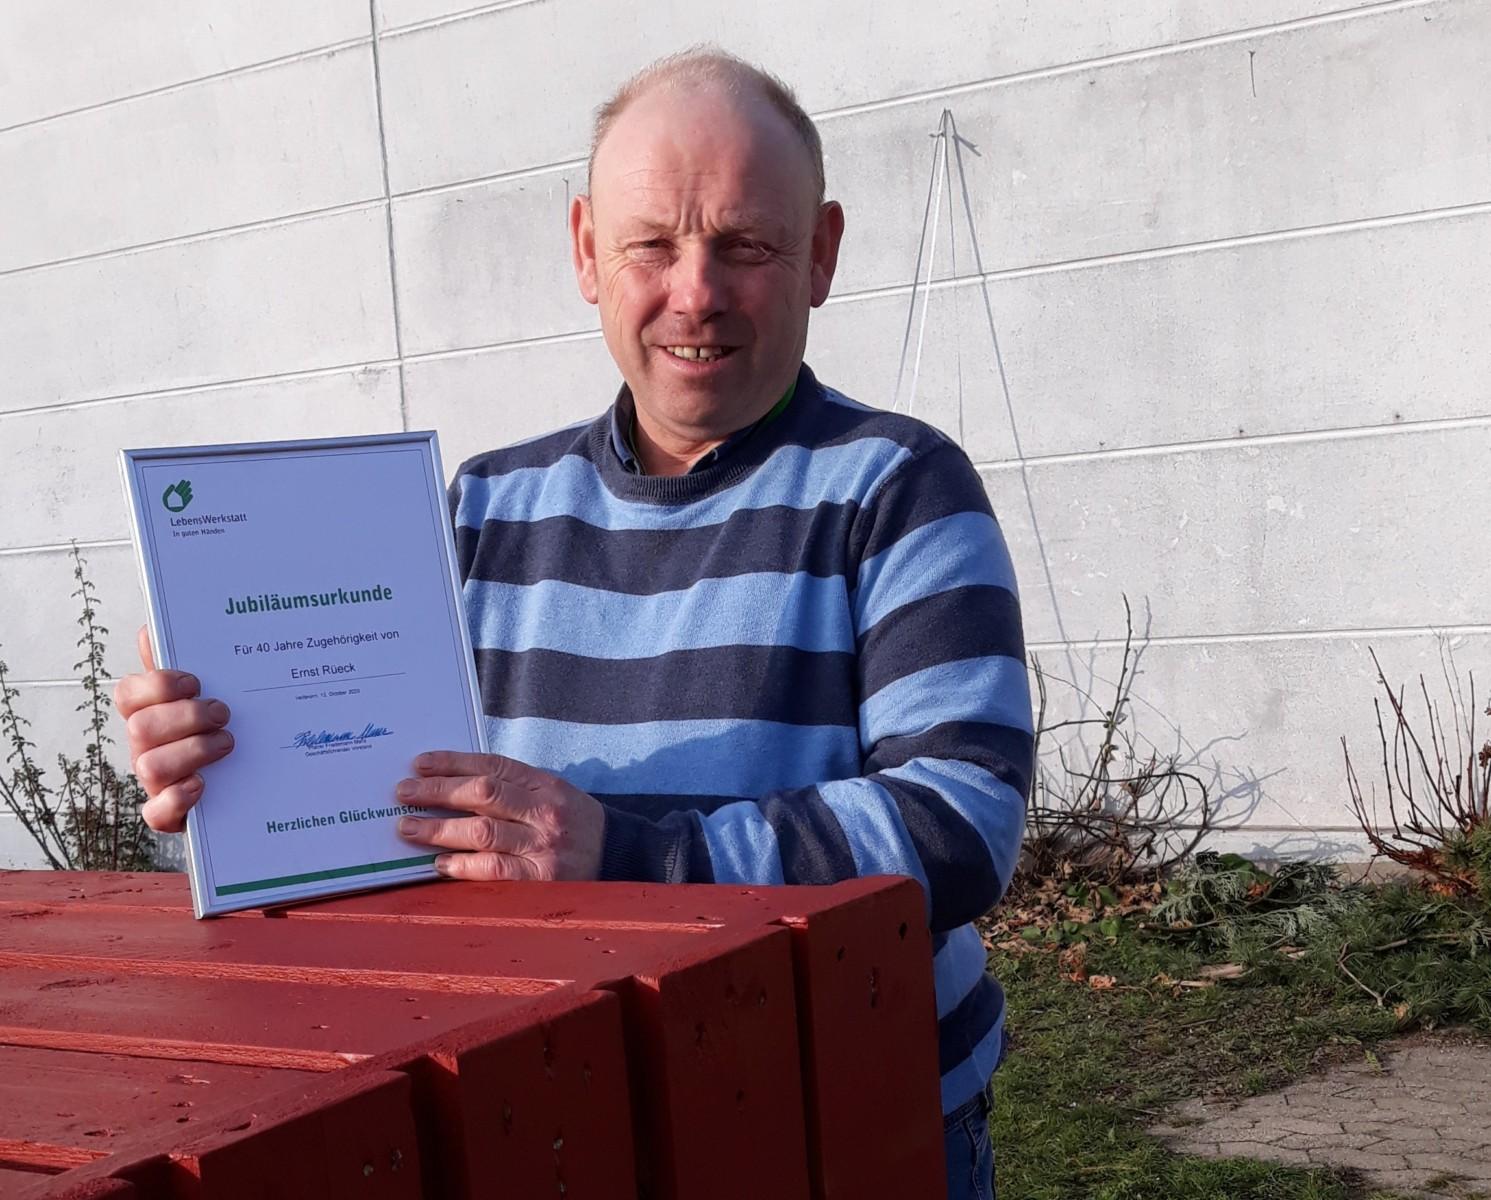 Glückwunsch an Ernst Rüeck – Crailsheimer Mitarbeiter feiert gleich zwei runde Jubiläen